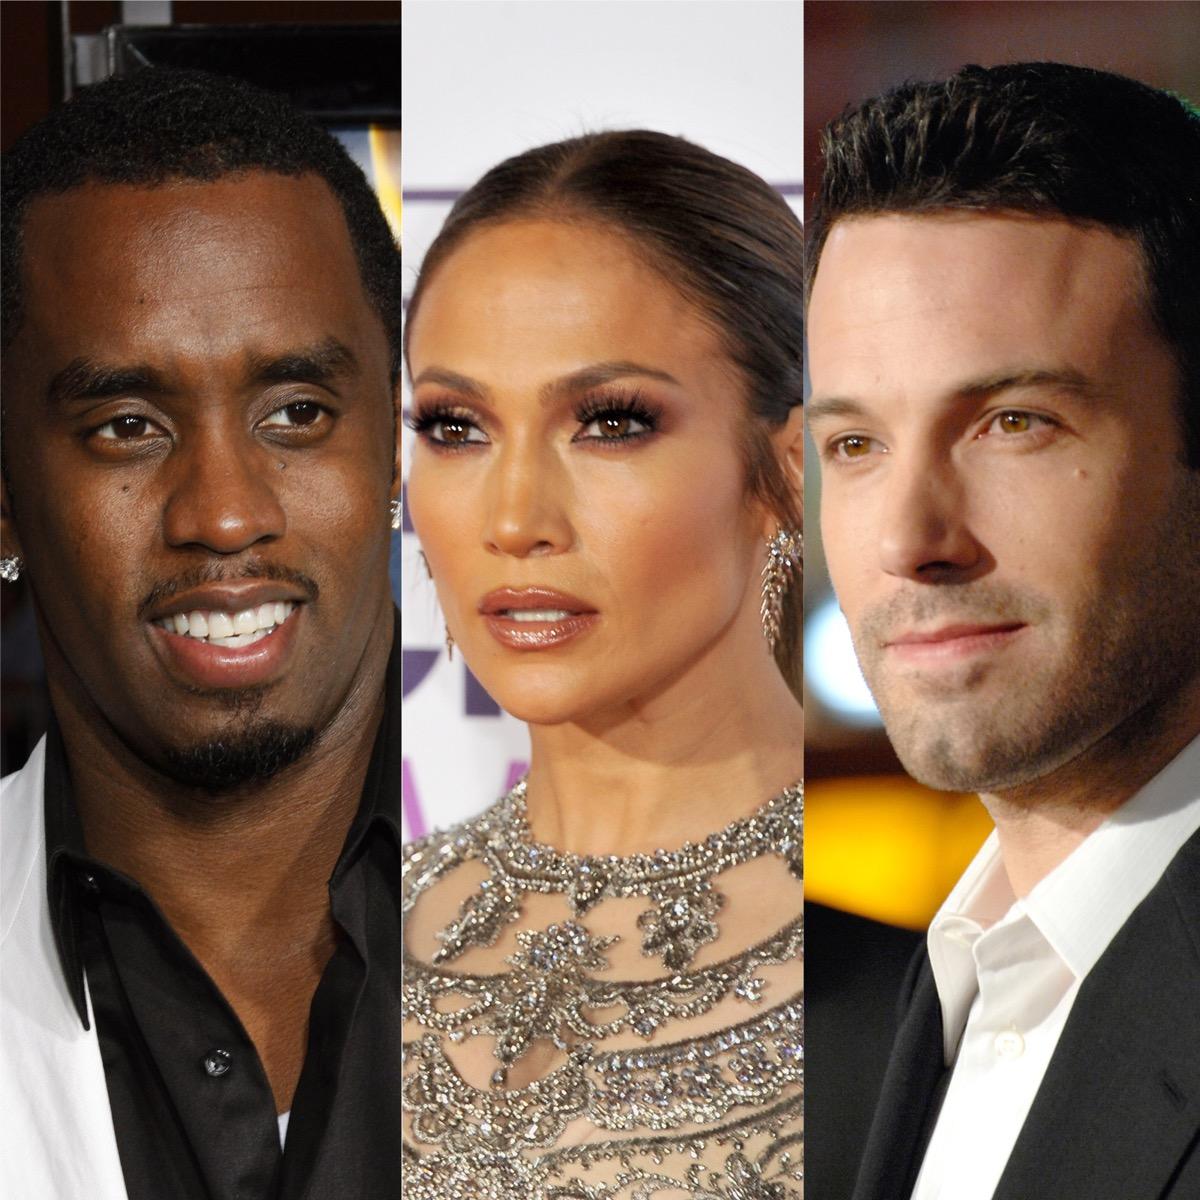 Sean Combs, Jennifer Lopez, and Ben Affleck